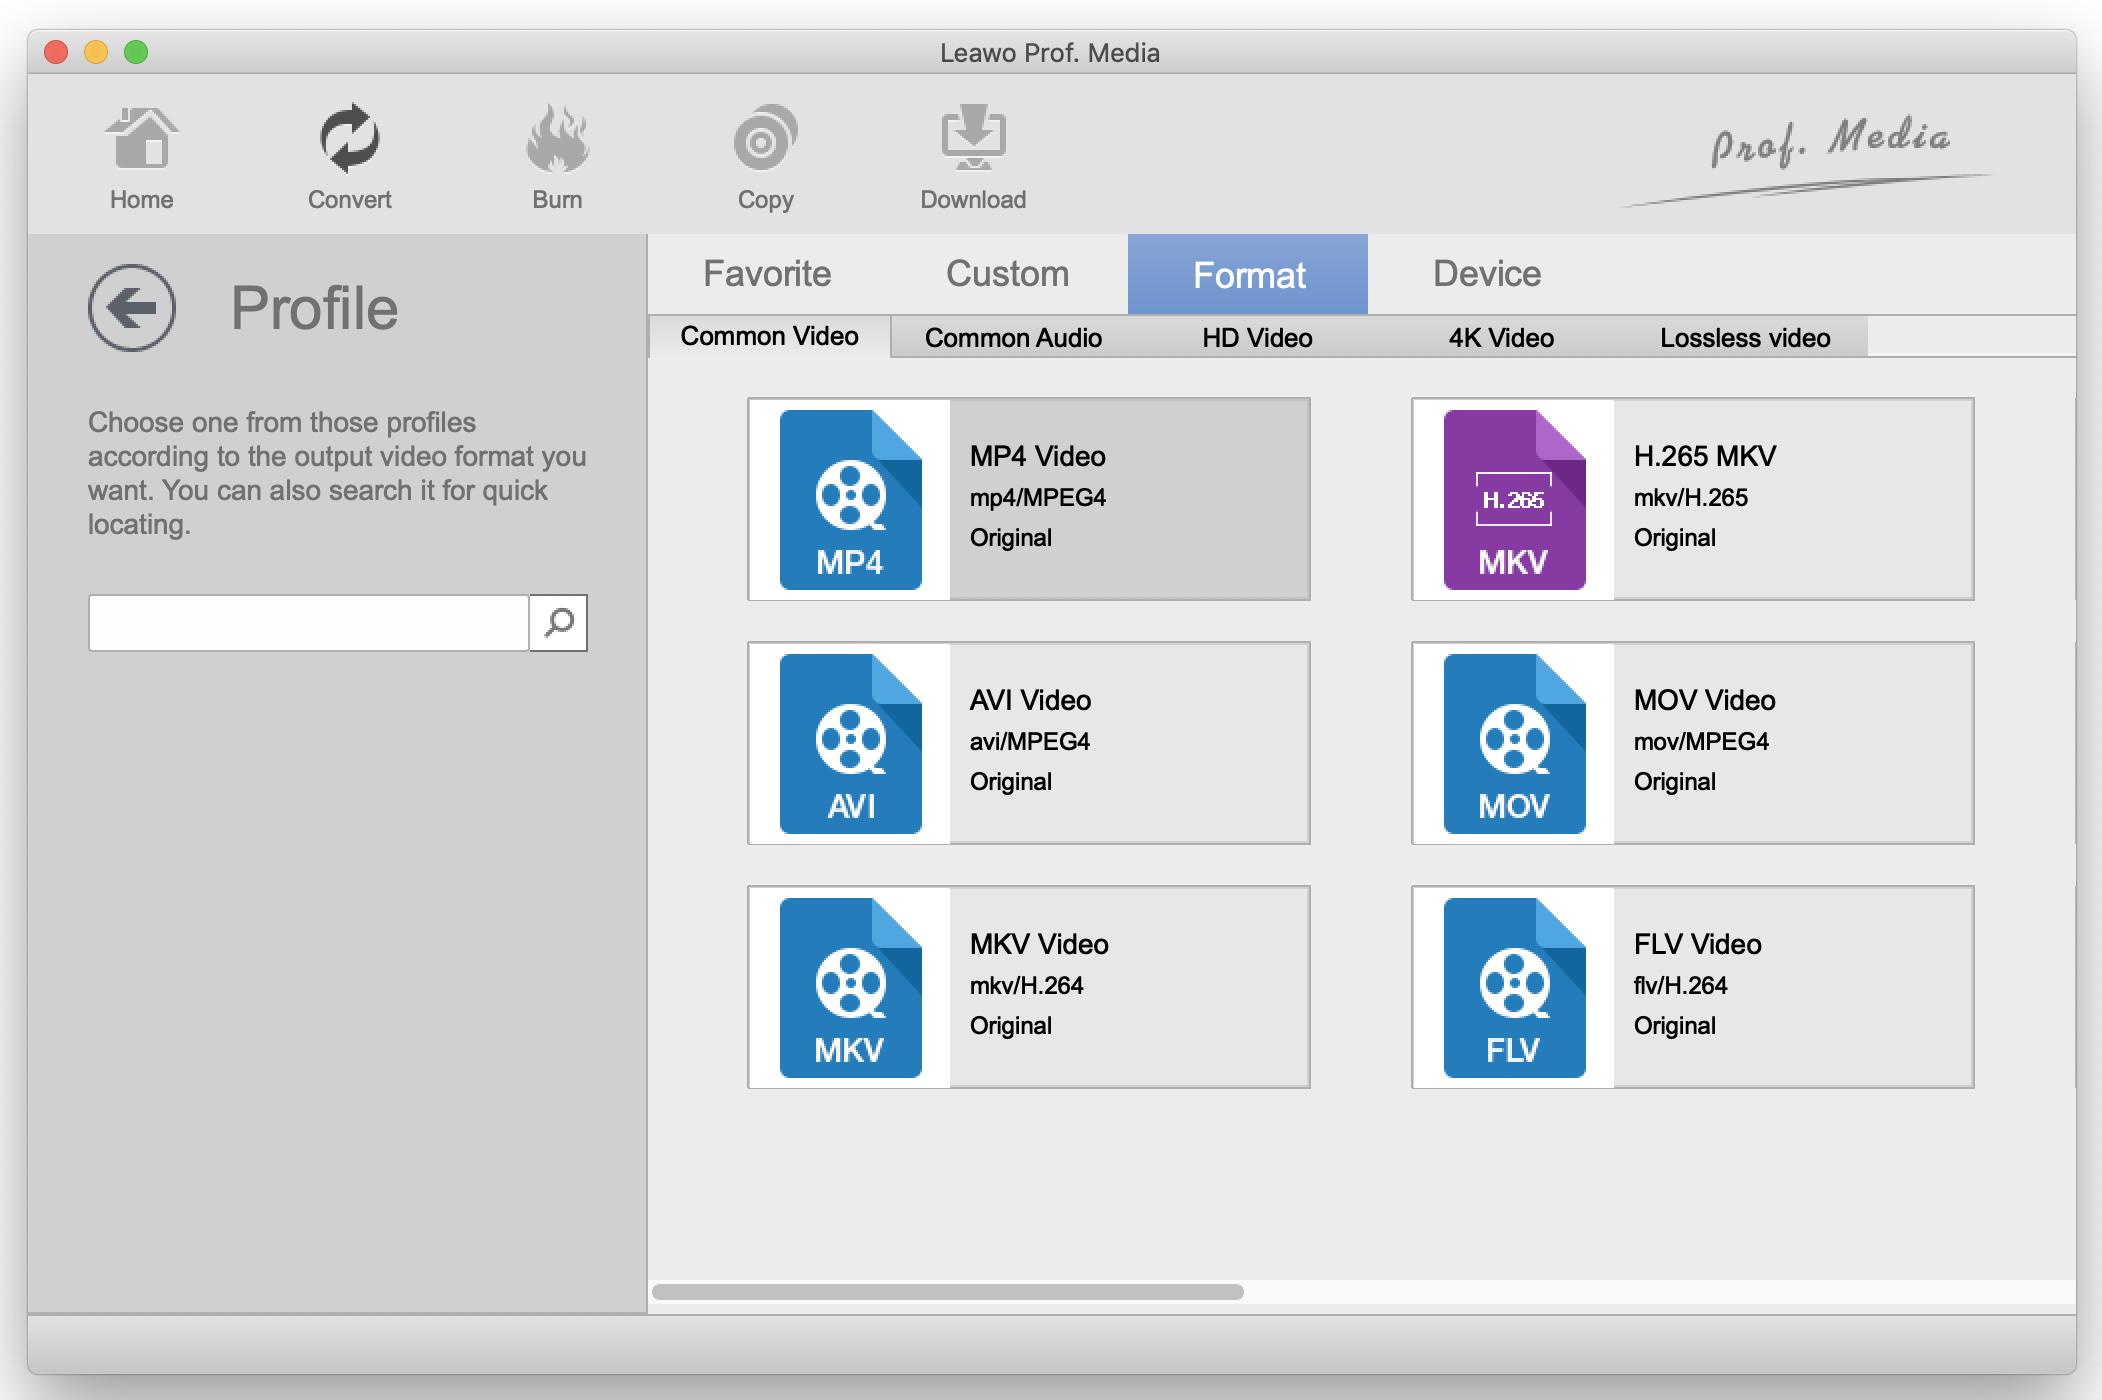 Leawo-output-profile-menu-video-audio-formats